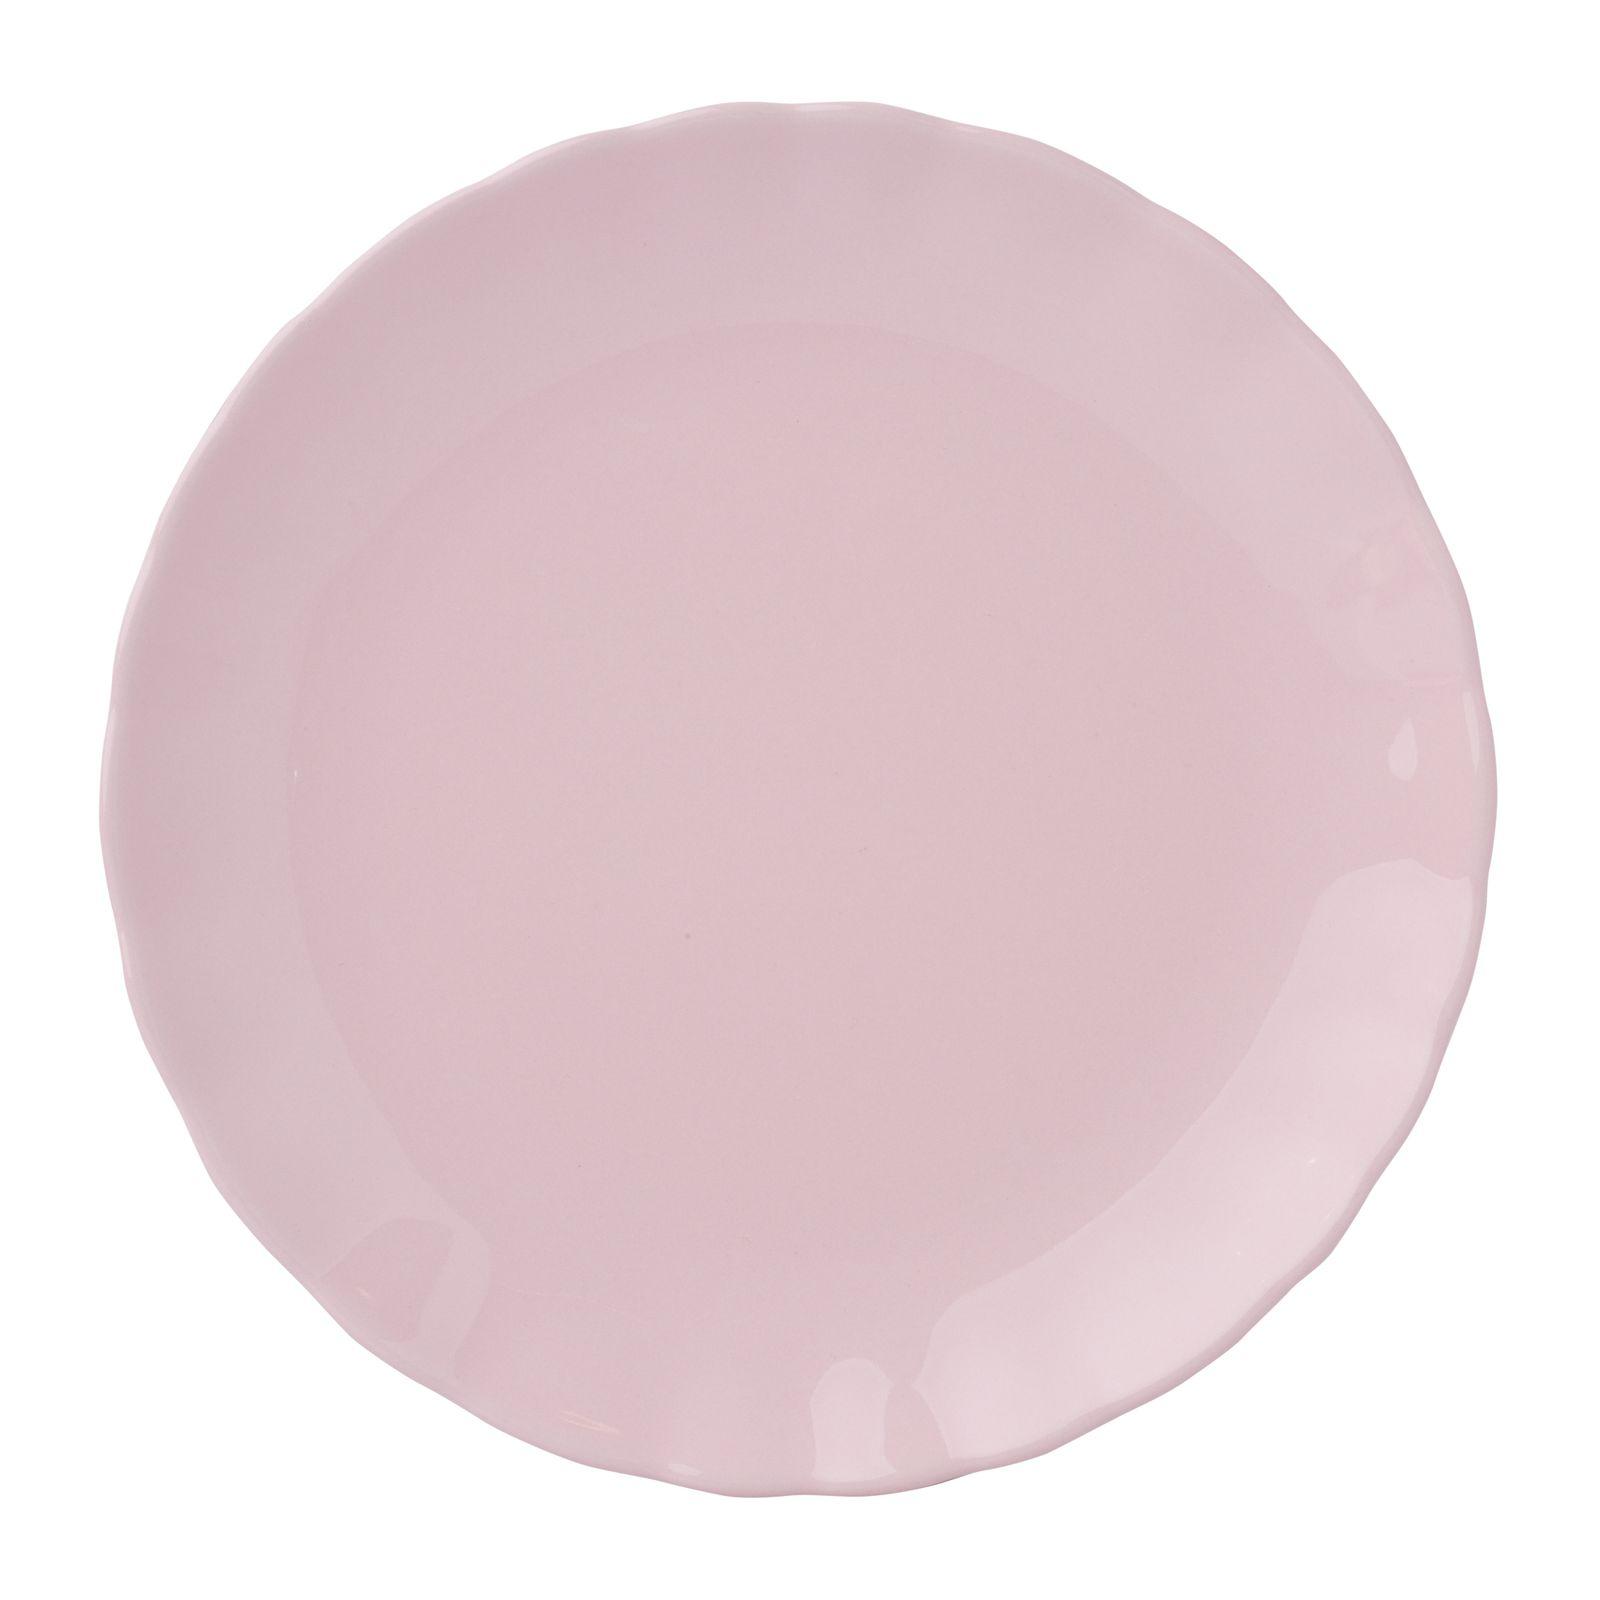 Talerz deserowy Diana Rustic Pink 19 cm AMBITION